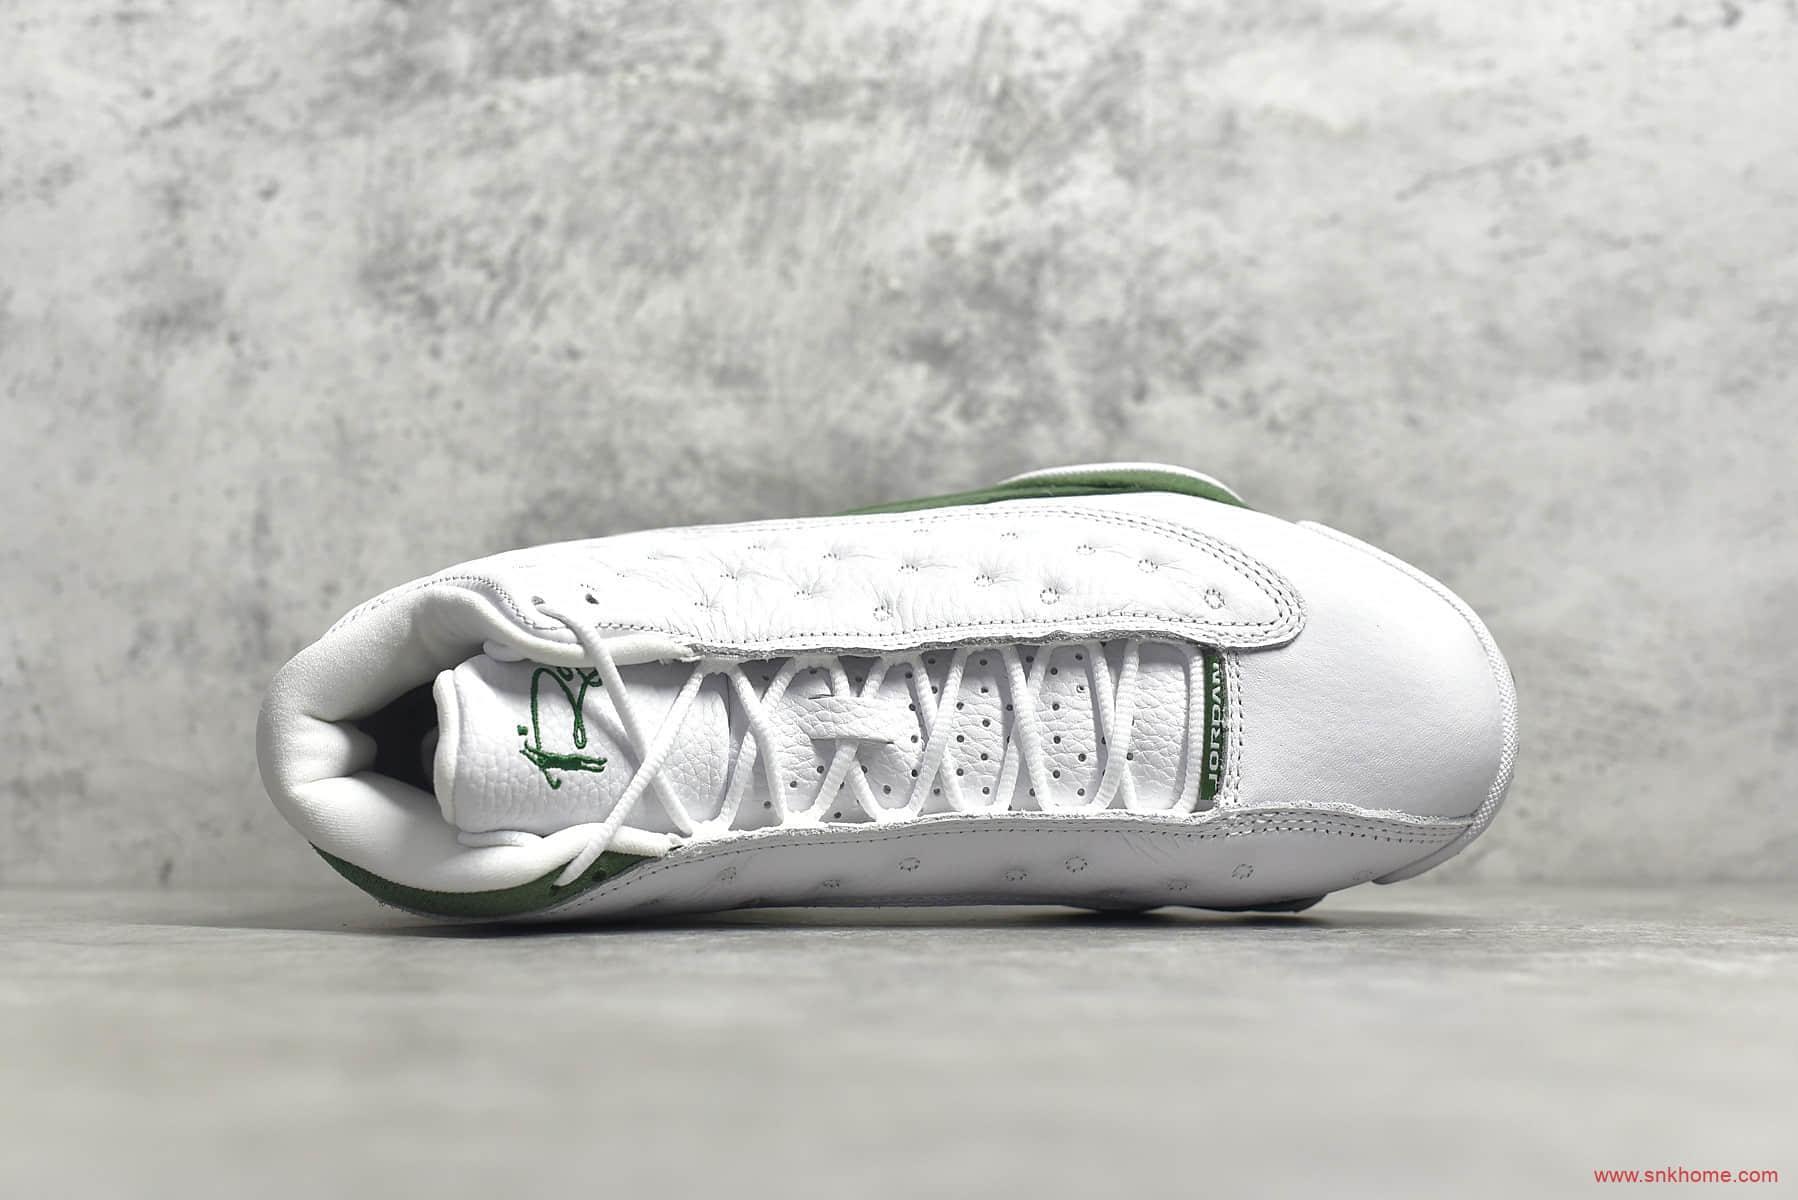 AJ13雷阿伦白蓝高帮球鞋 Air Jordan 13 Ray PE AJ13 雷阿伦AJ13实战篮球鞋 货号:414571-125-潮流者之家